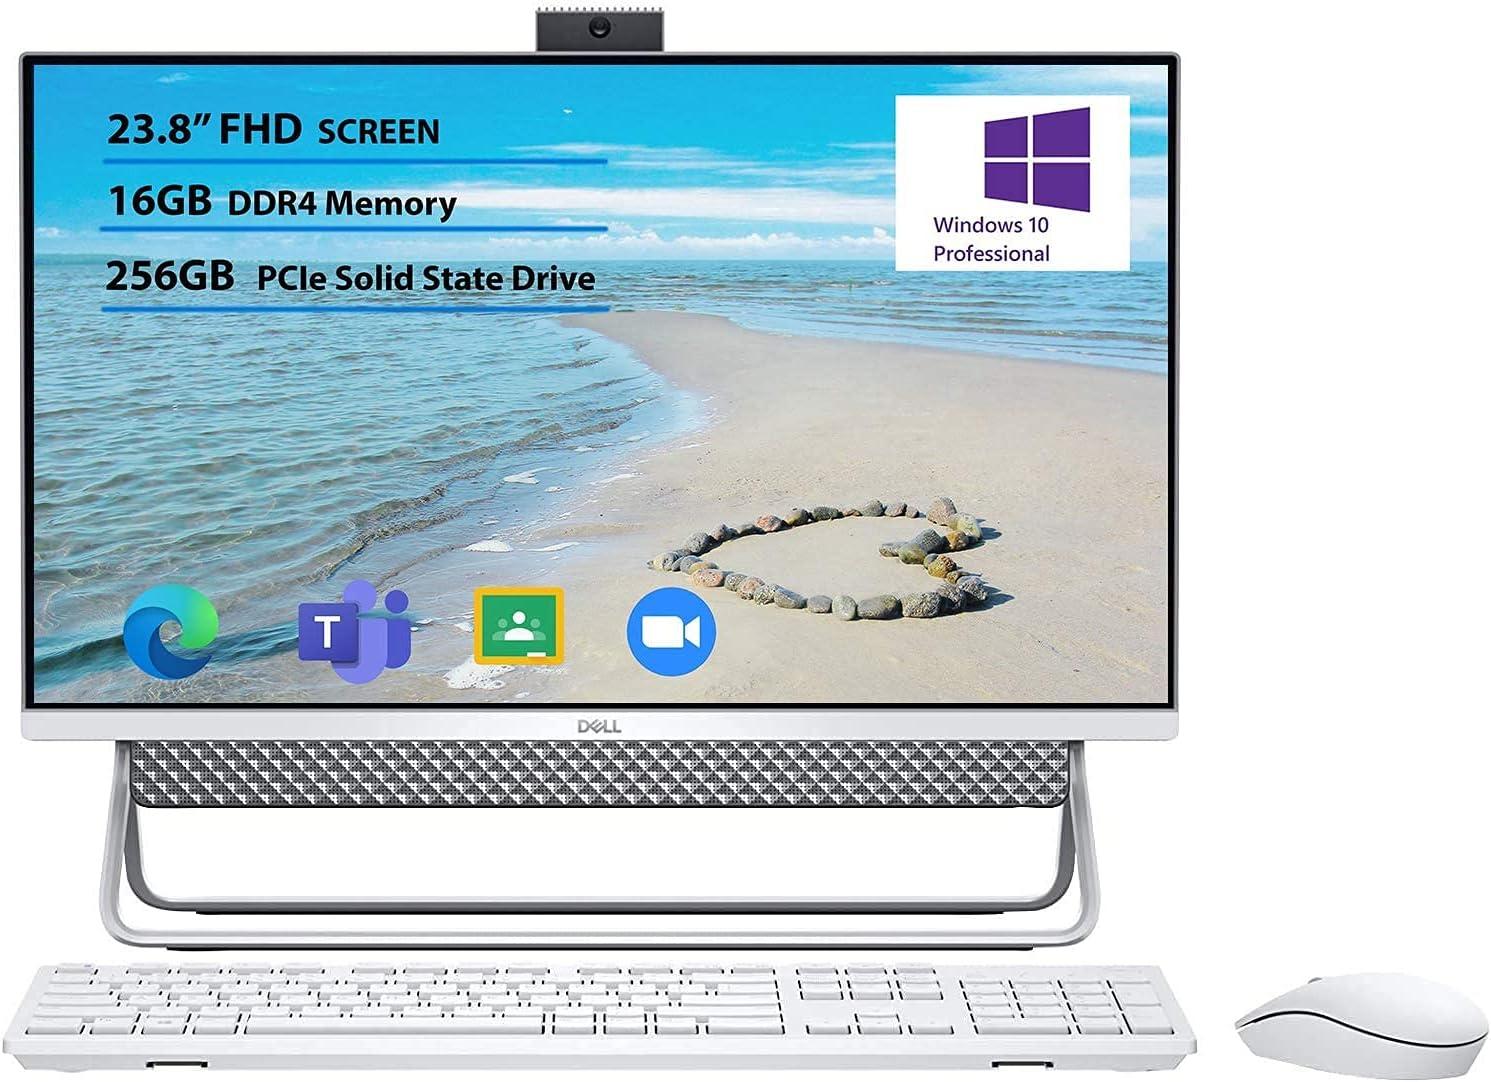 "Newest Flagship Dell Inspiron 24 5000 All in one Desktop Computer 23.8"" FHD Narrow Border Display Intel Core i3-10110U 16GB RAM 256GB SSD Intel UHD Graphics USB-C Wifi5 Windows 10 Pro"